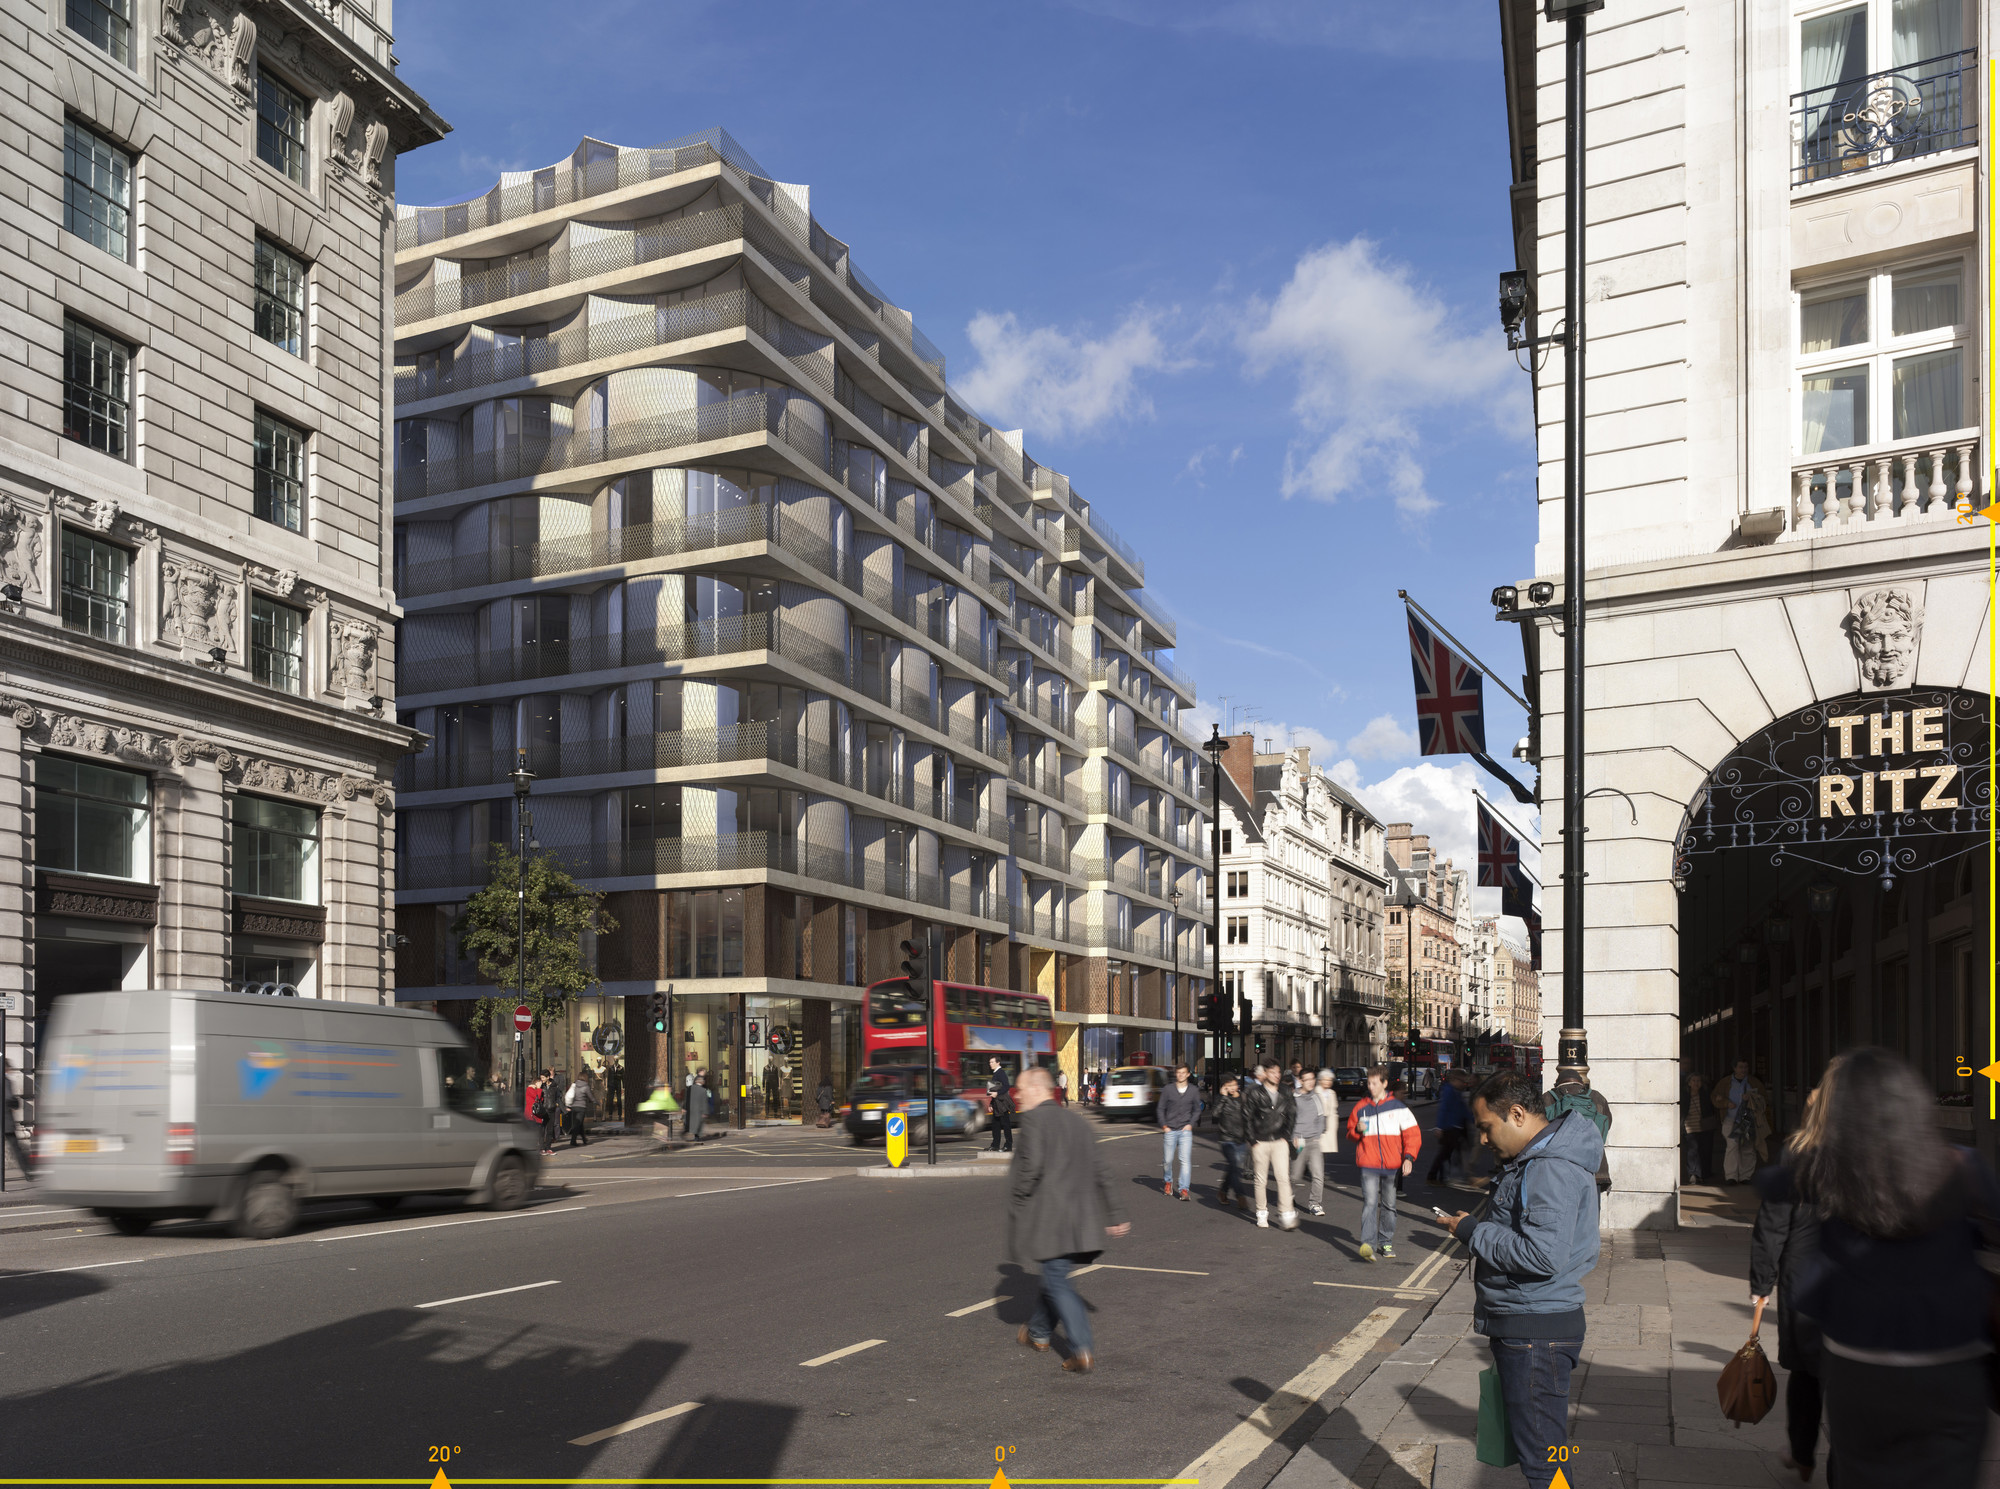 First Images of David Adjaye's £600 Million Piccadilly Redevelopment Plan, Courtesy of Adjaye Associates